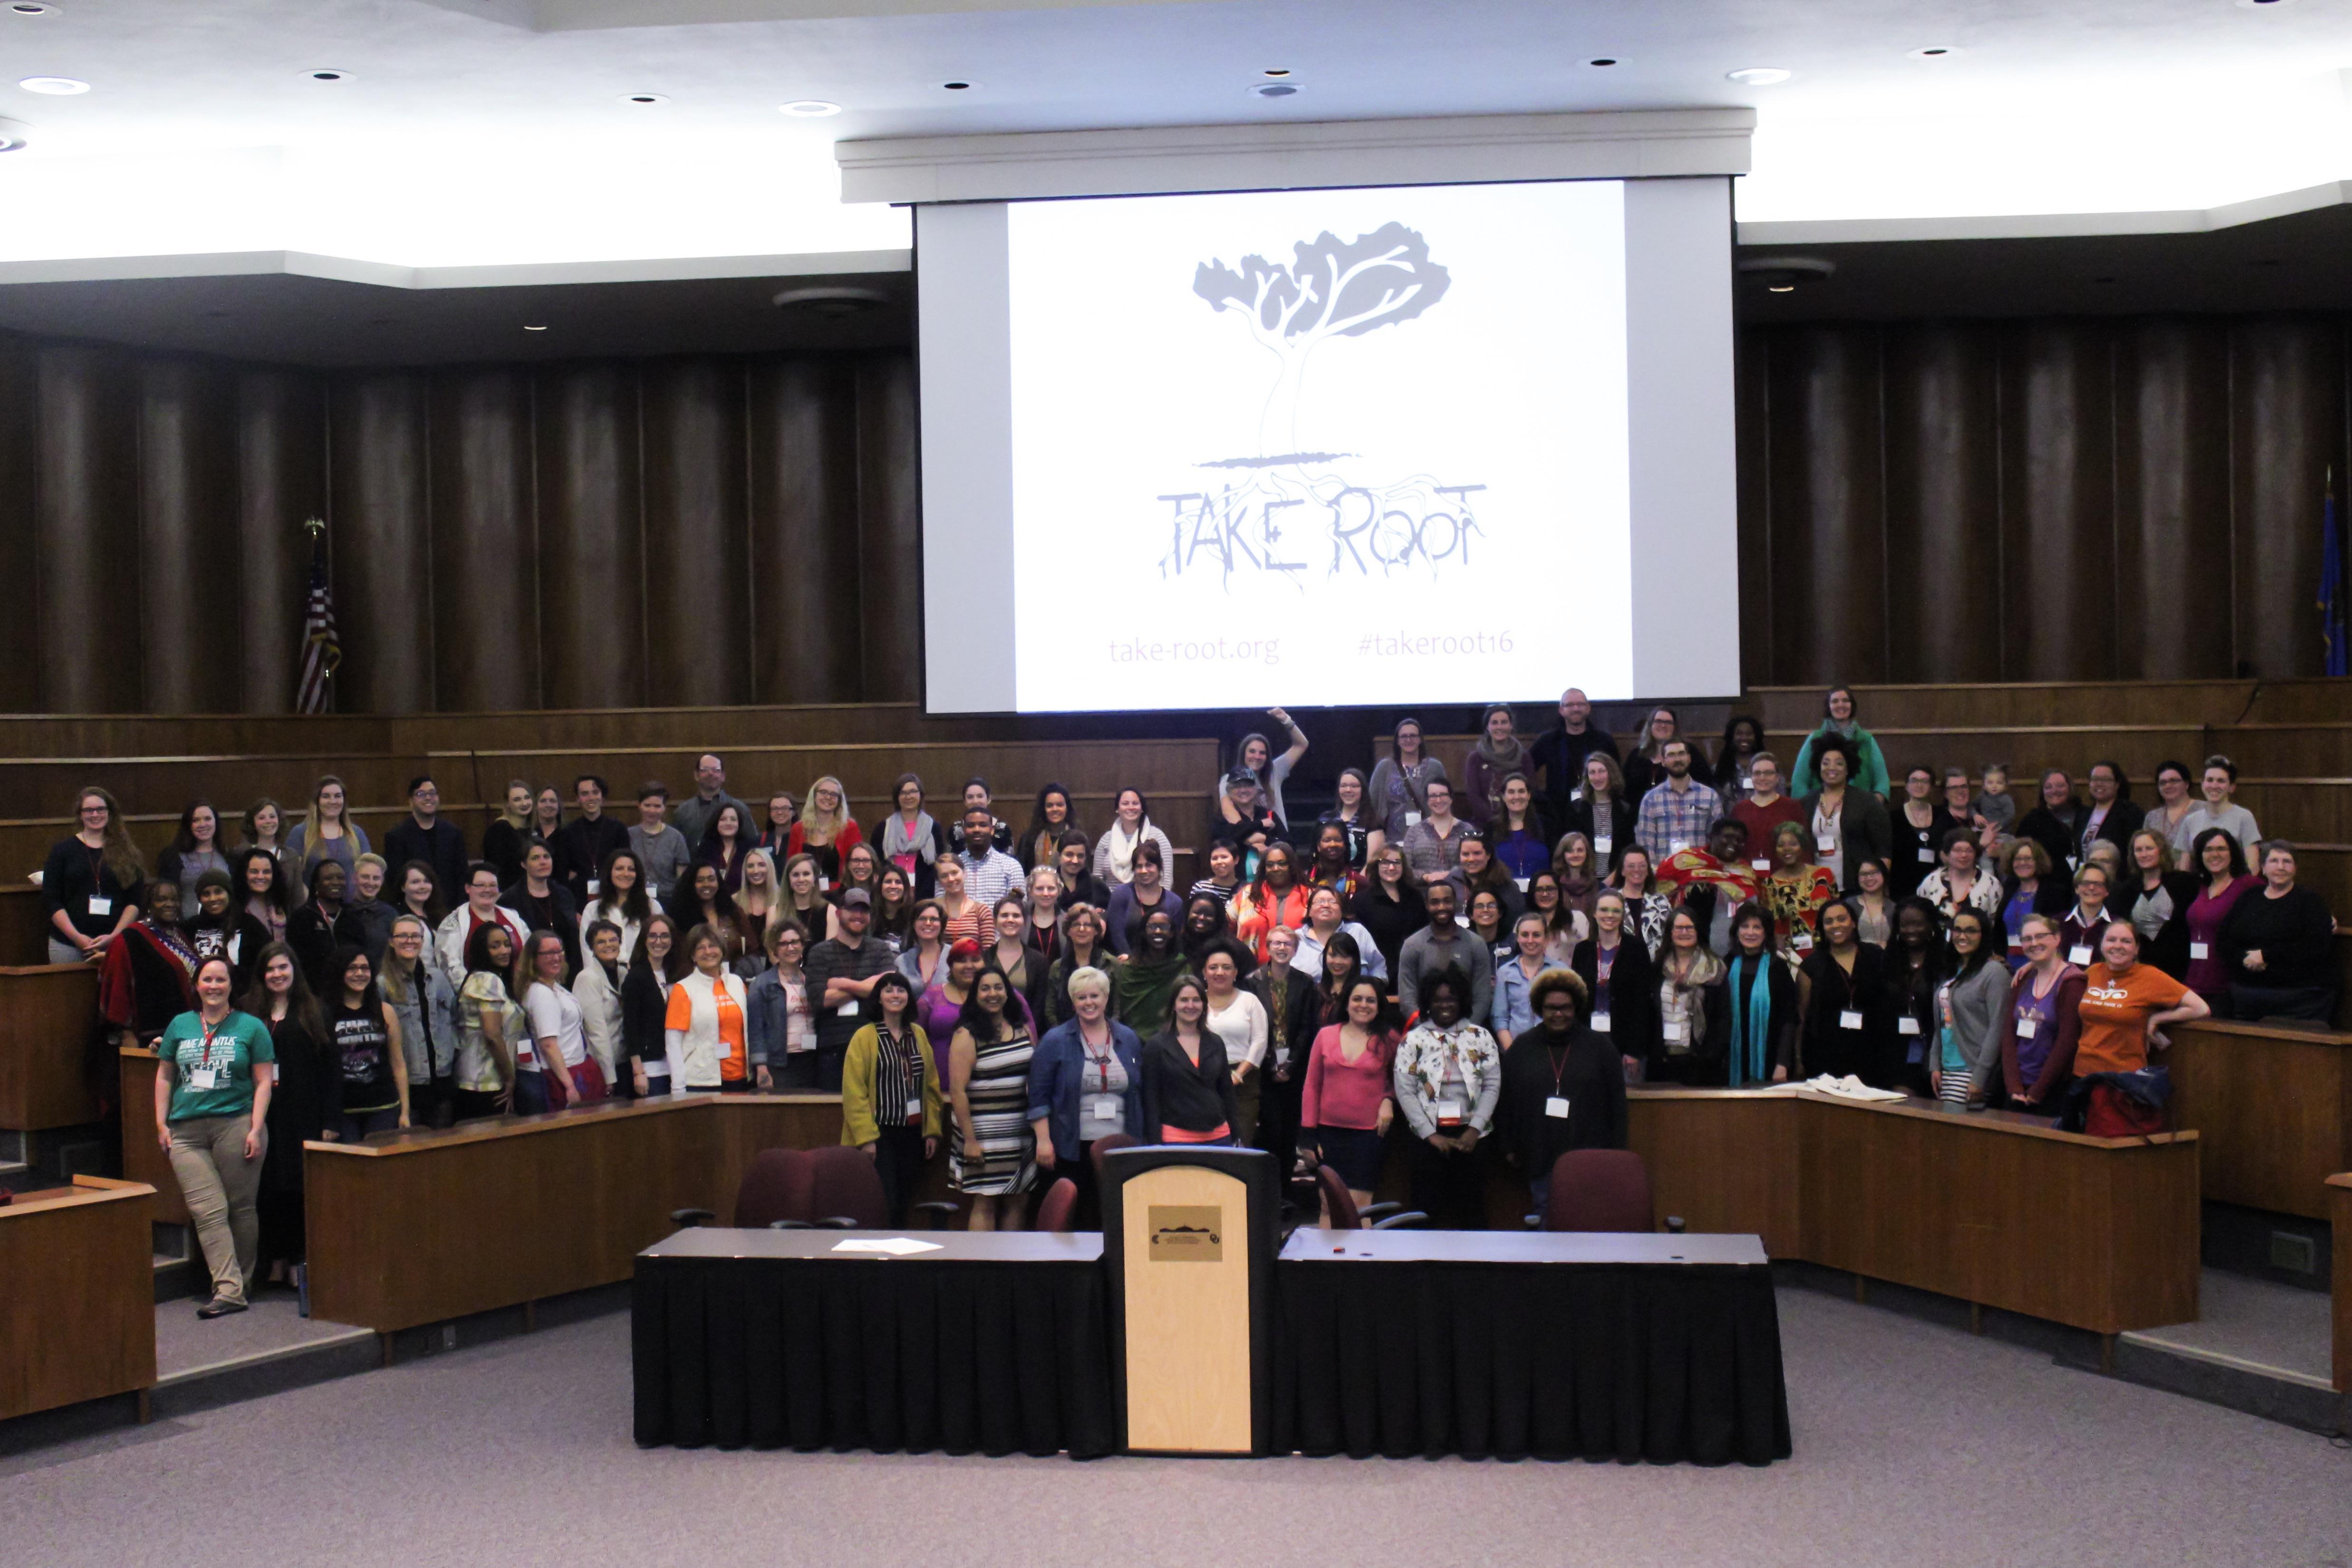 Take Root 2018: General Registration